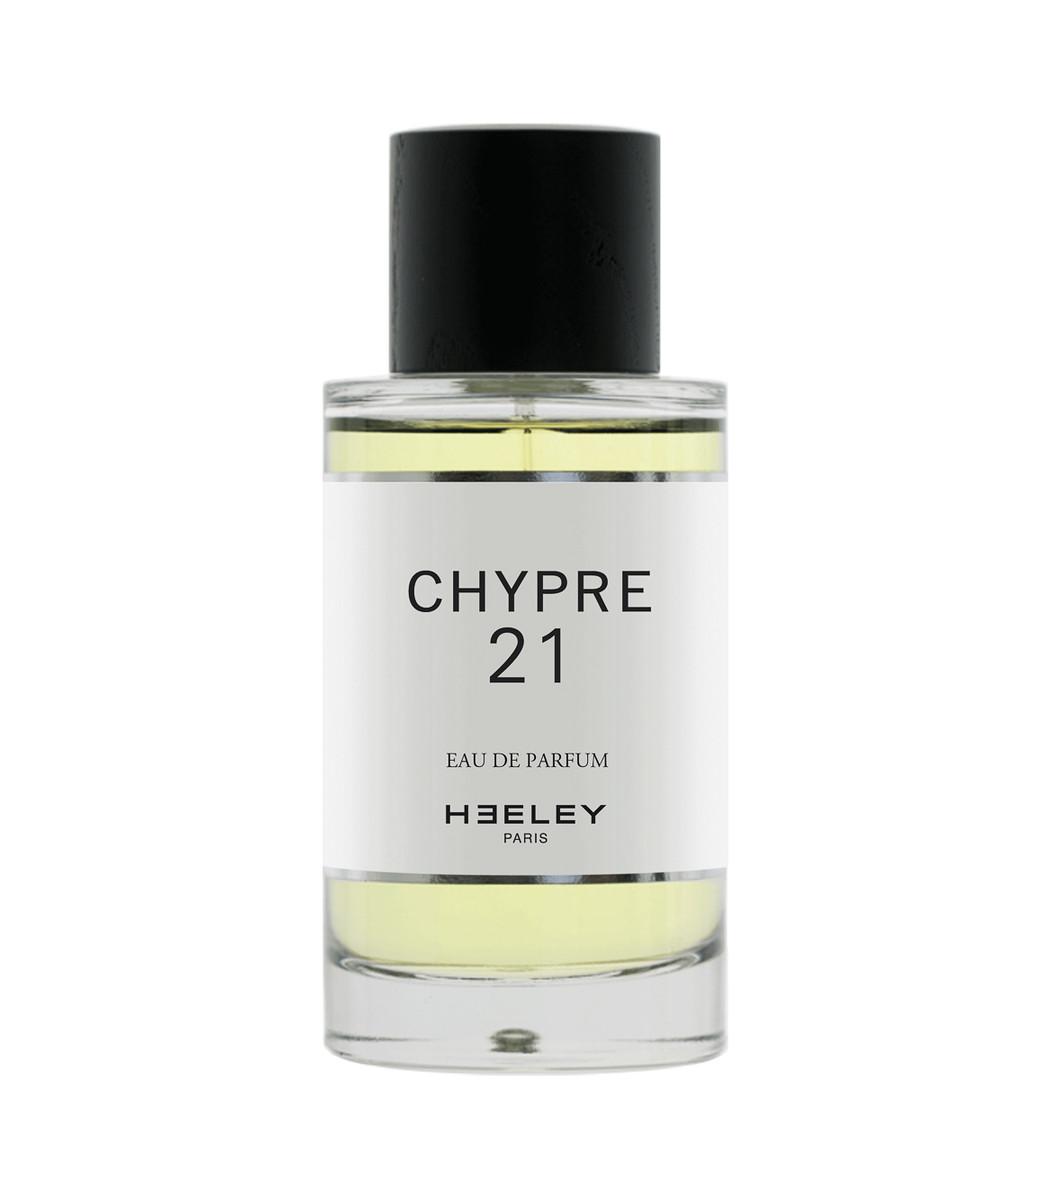 HEELEY PARFUMS Chypre 21